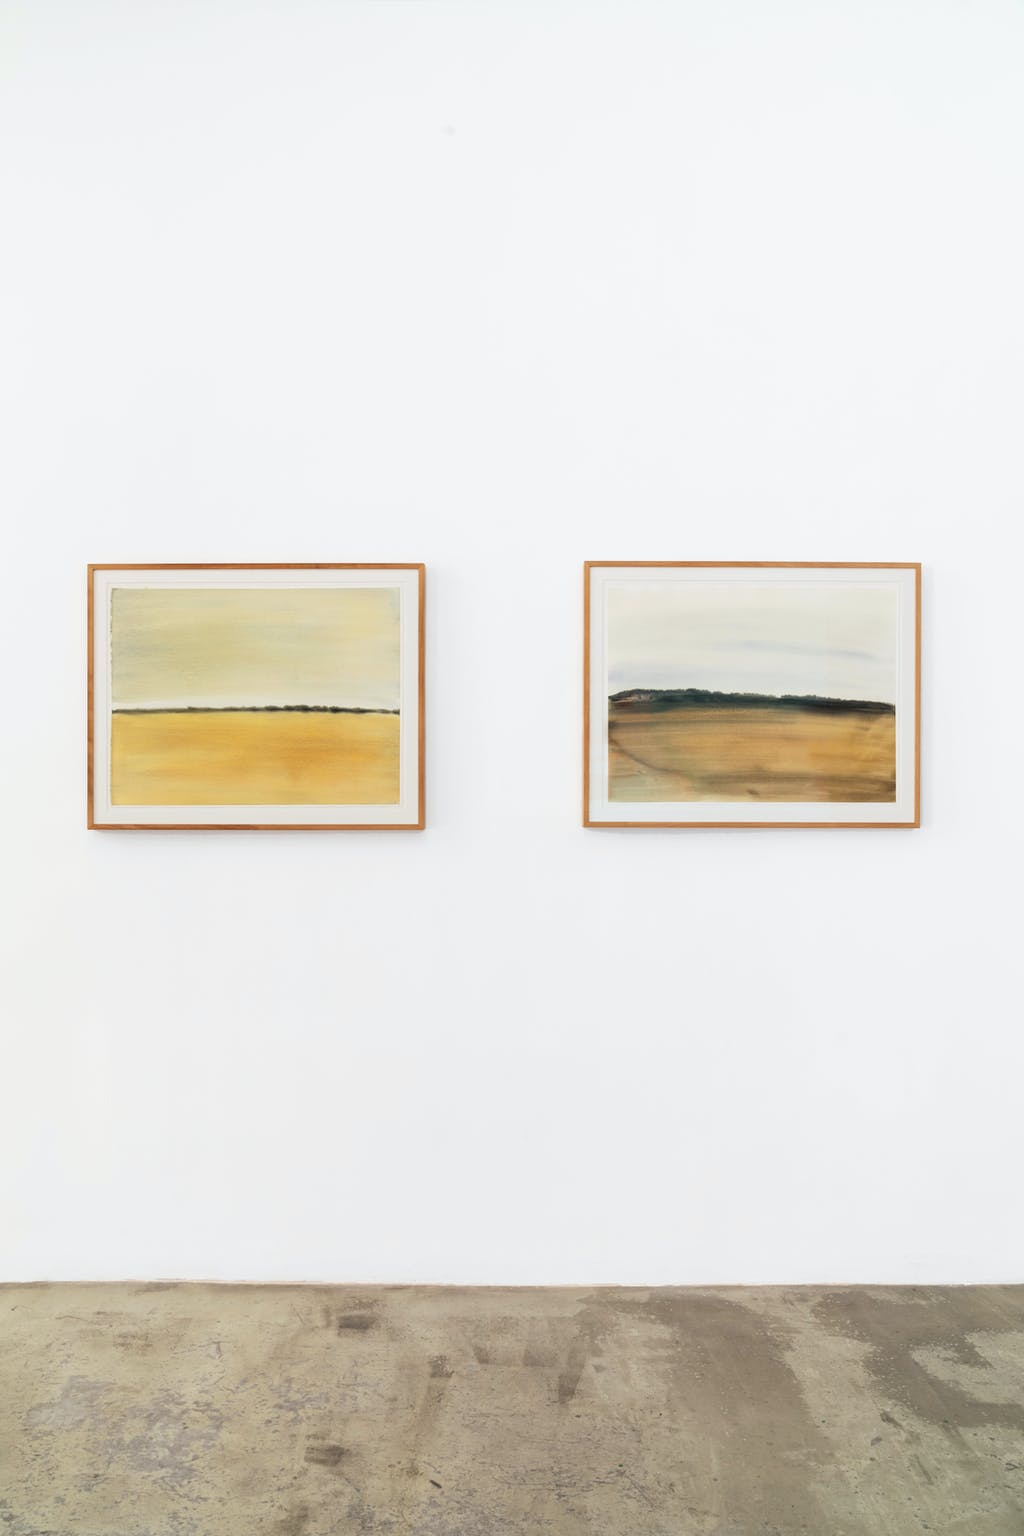 Ignacio Gelabert, Still Land